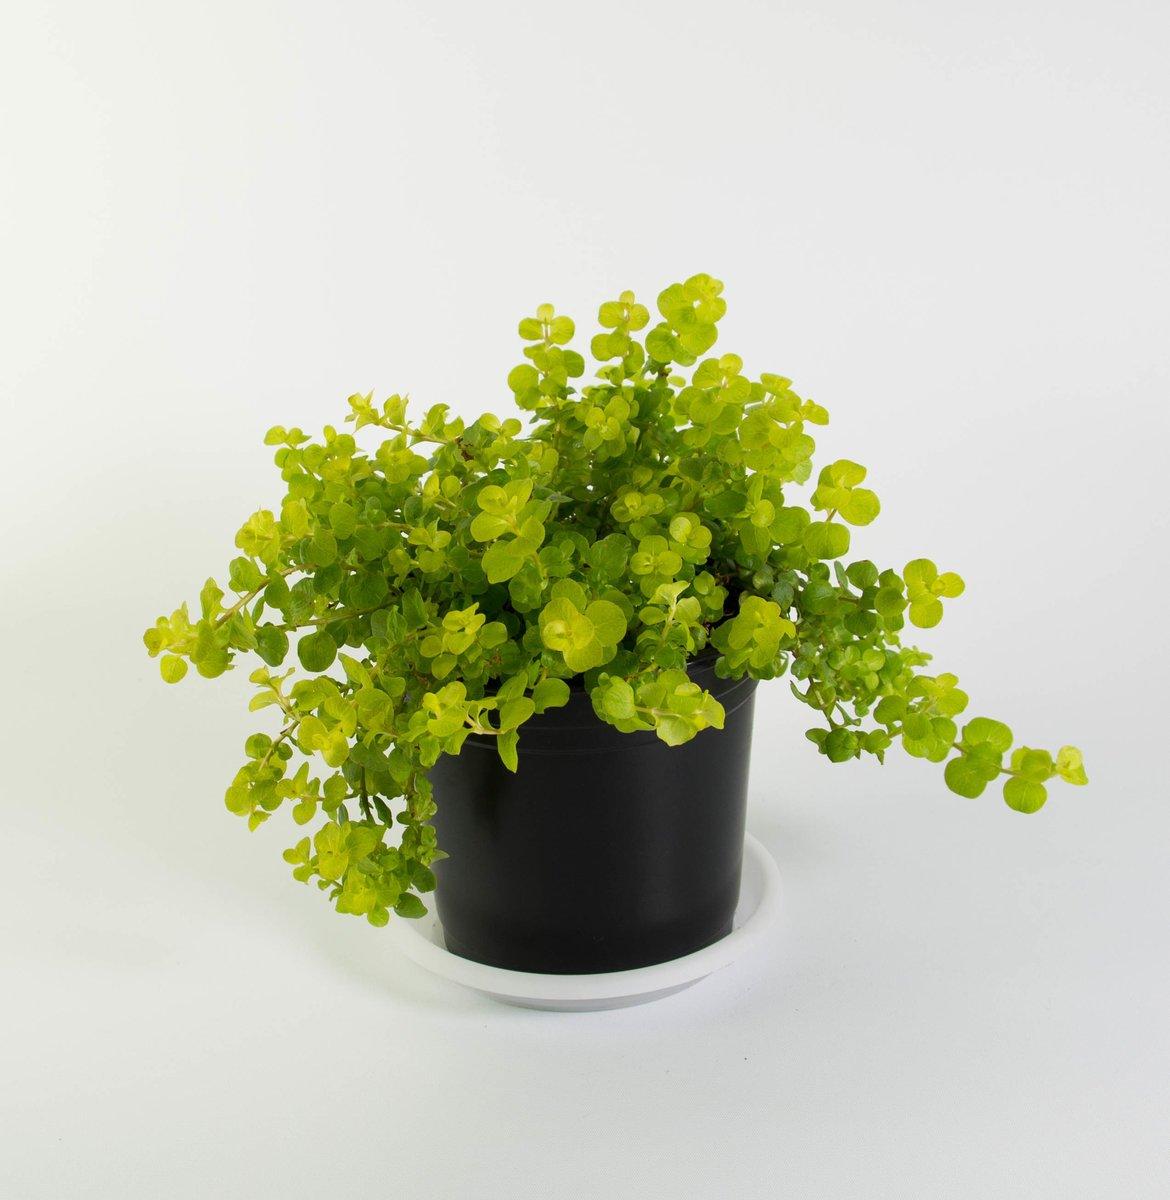 "Picture of Goldilocks Moneywort - Lysimachia - Creeping Jenny - 2 (Two) Live Plant Fit 4"" Pot"